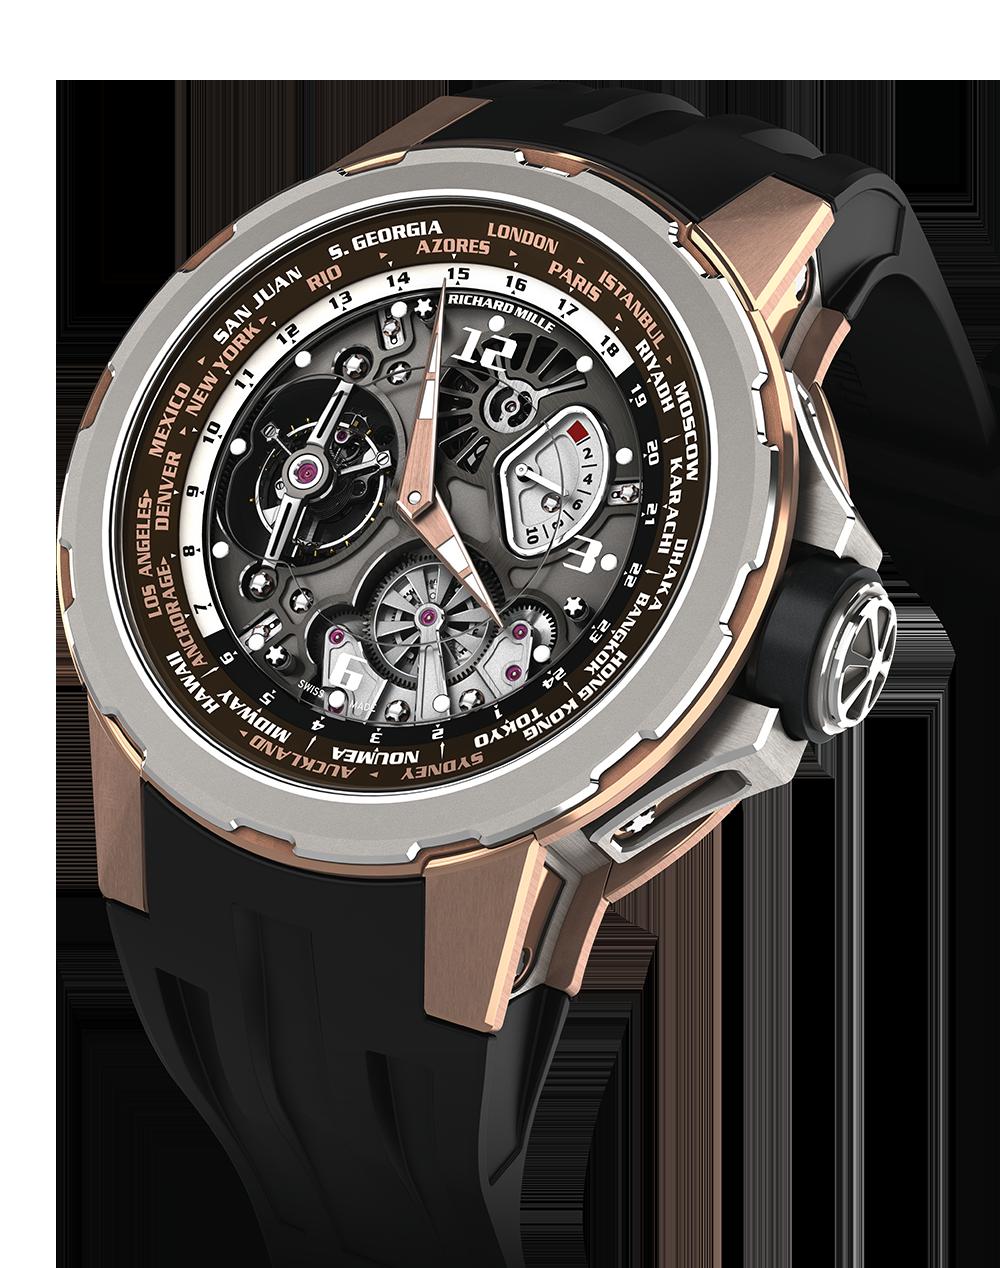 Richard Mille - RM 5801Tourbillon World Timer  Jean Todt